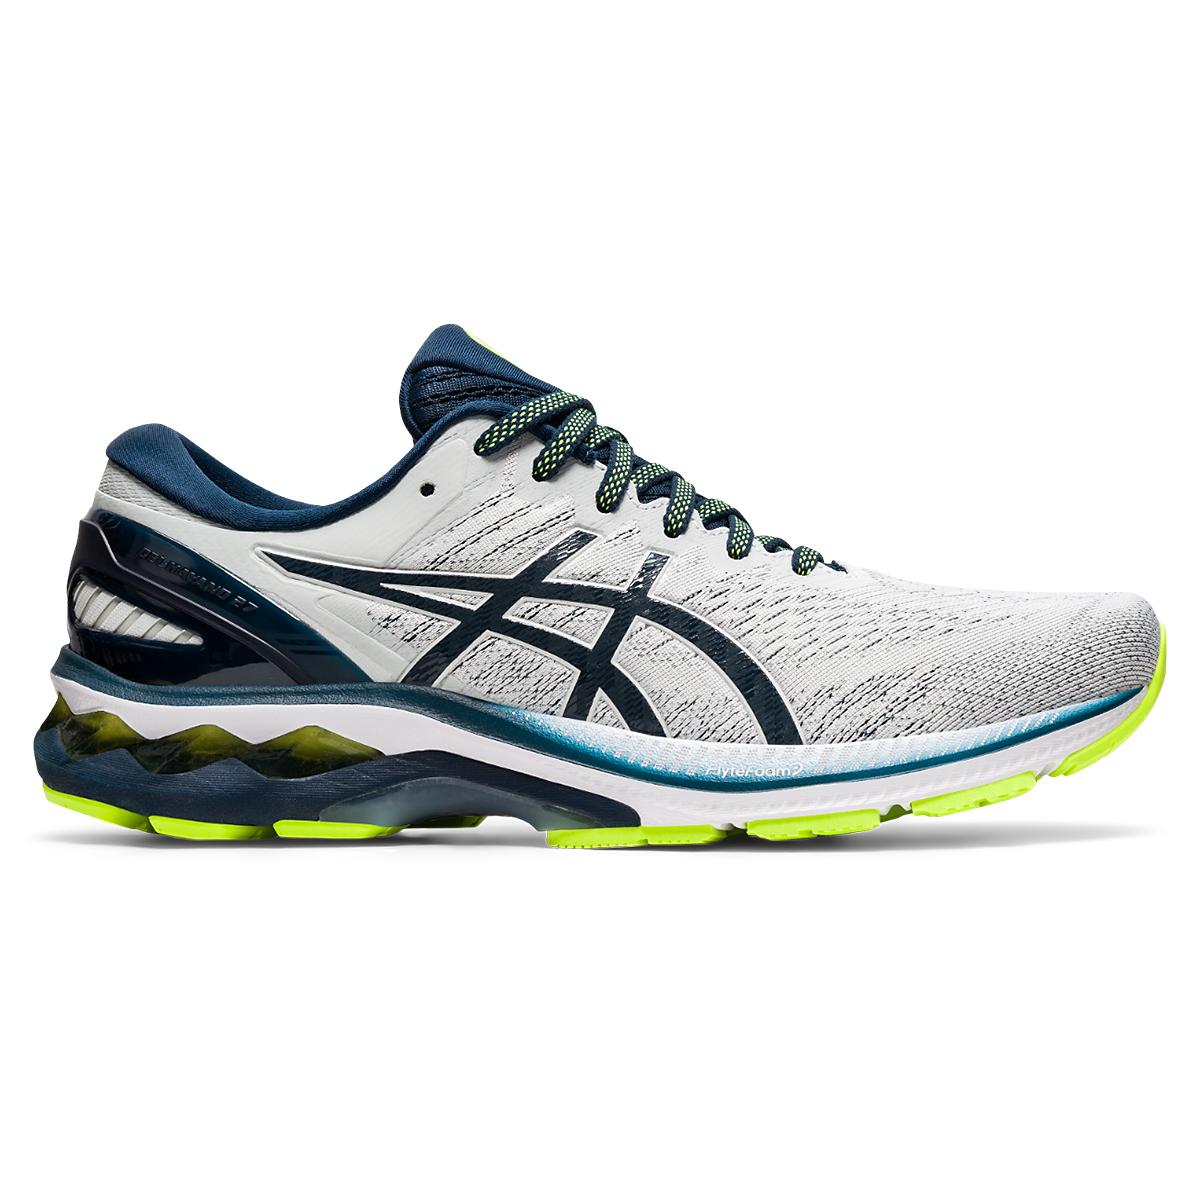 Men's Asics Gel-Kayano 27 Running Shoe - Color: Grey/Green/Blue - Size: 7 - Width: Regular, Grey/Green/Blue, large, image 1